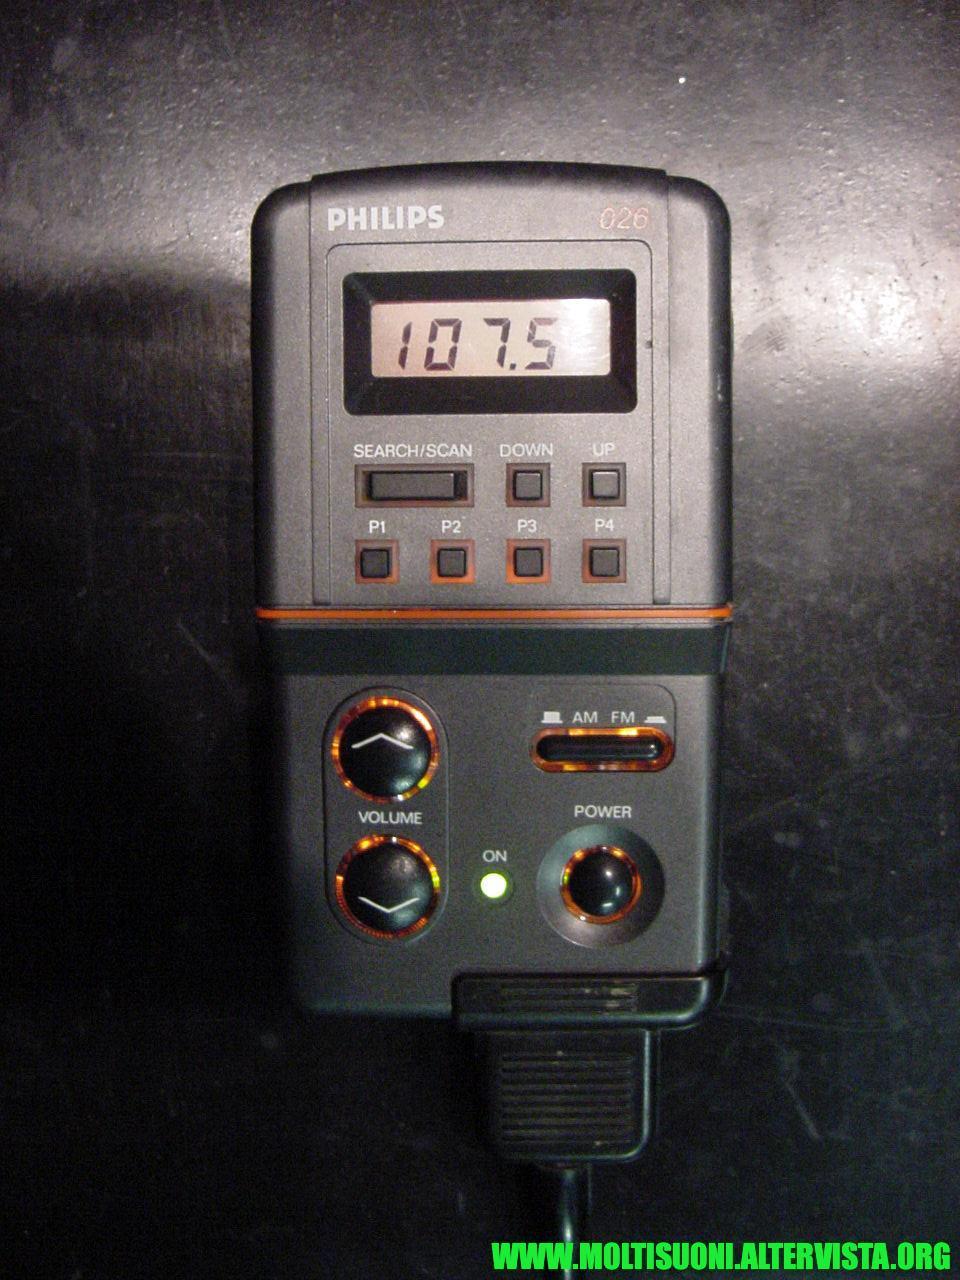 Philips split radio DC 026 - moltisuoni 3